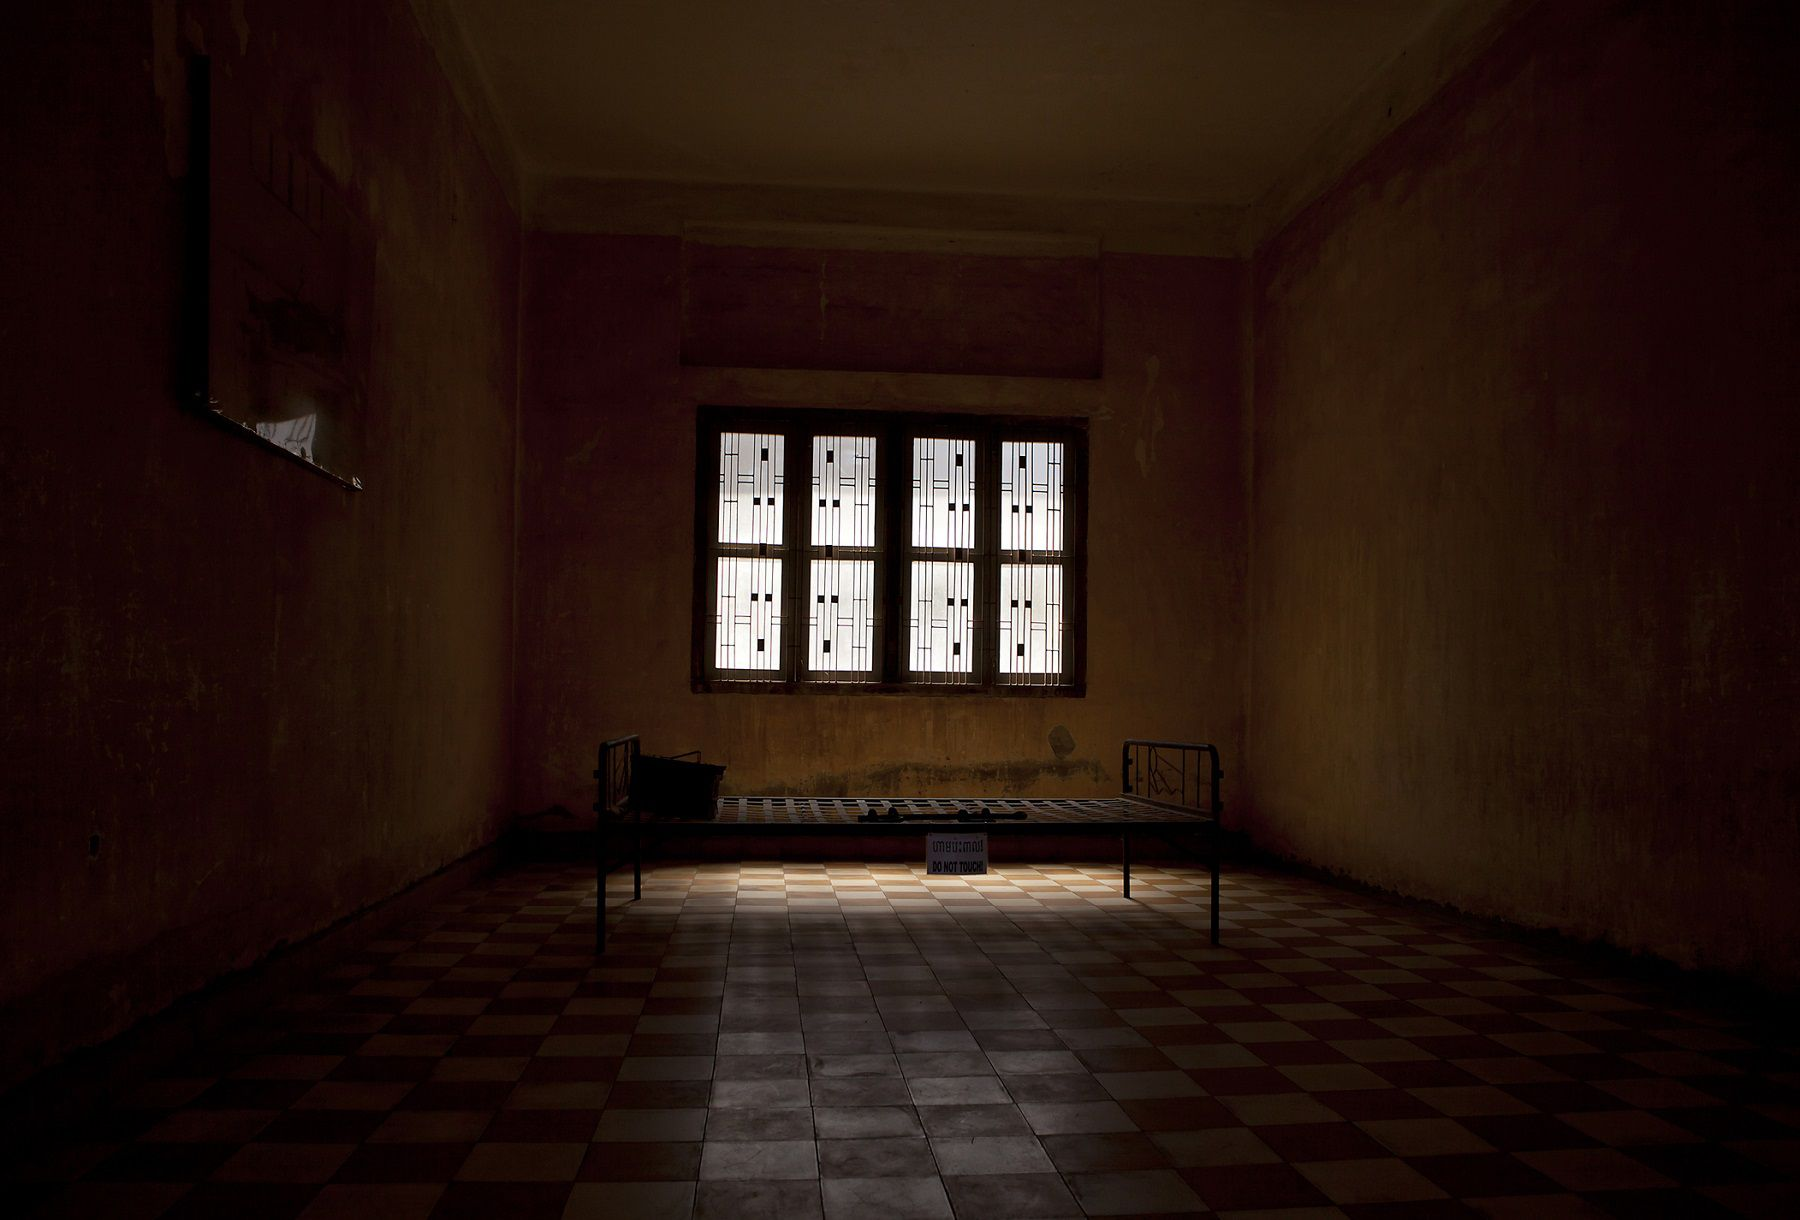 Room in Tuol Sleng, Phnom Penh, Cambodia